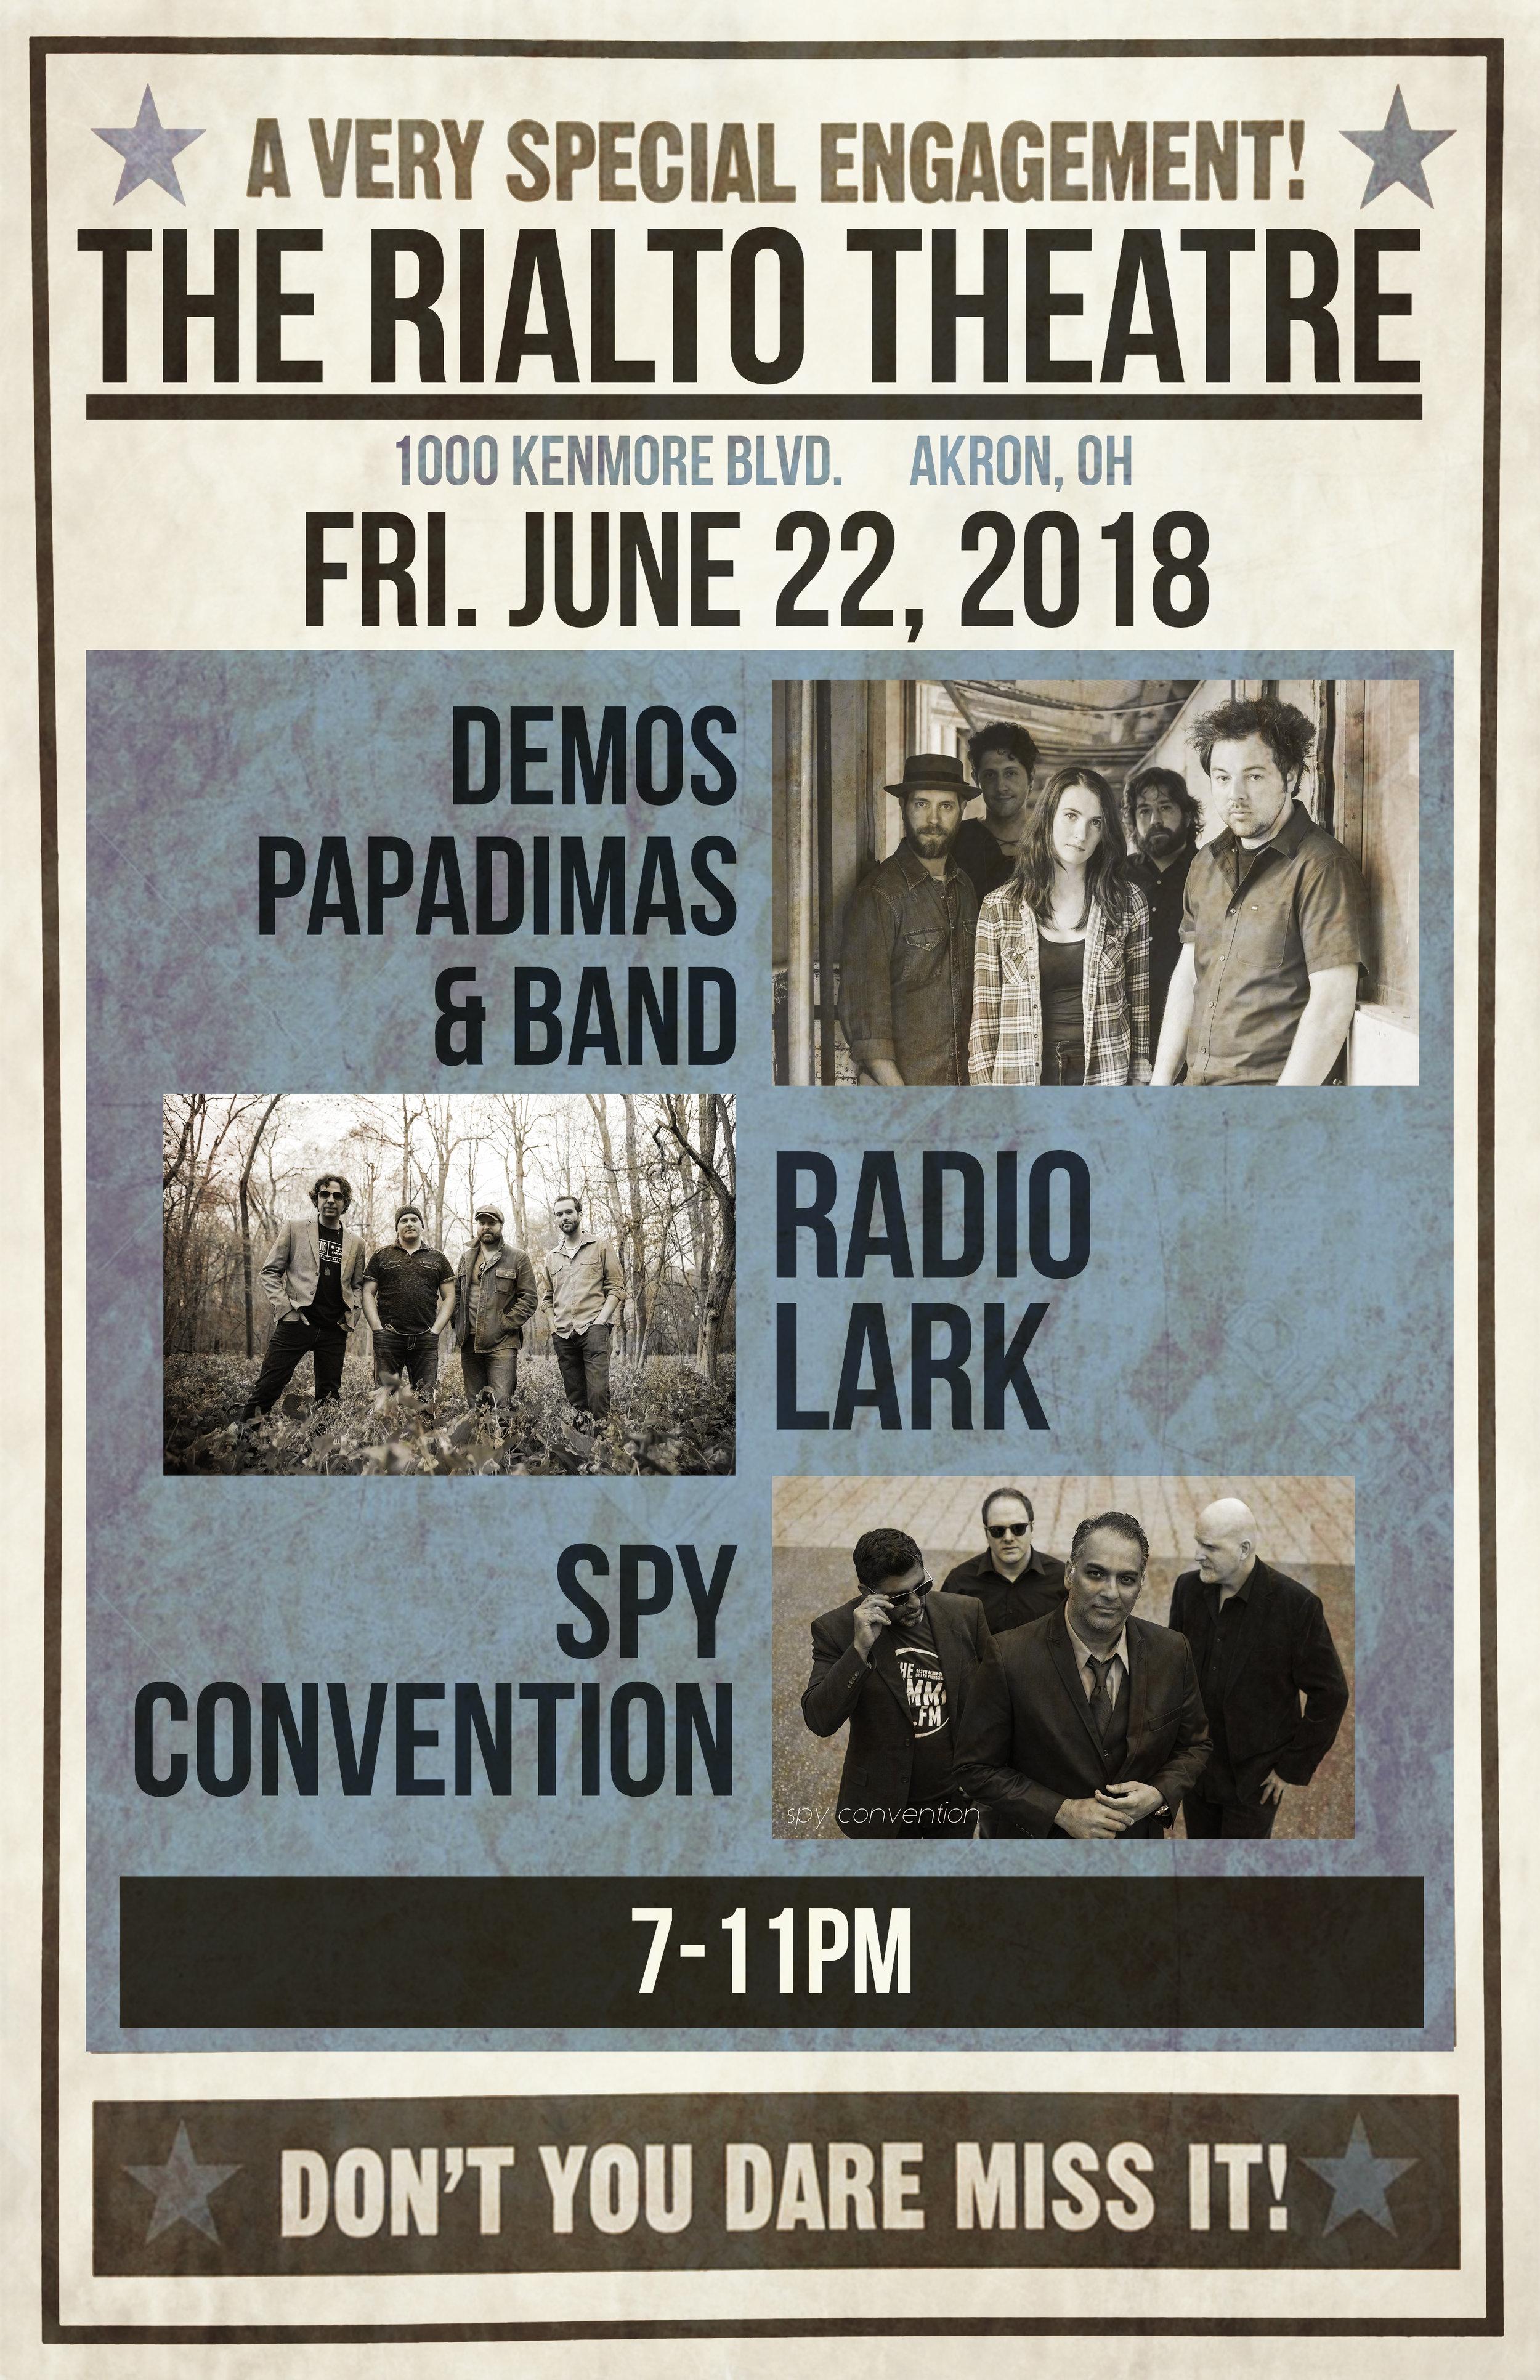 DEMOS RADIO LARK SPY CONVENTION AKRON.jpg